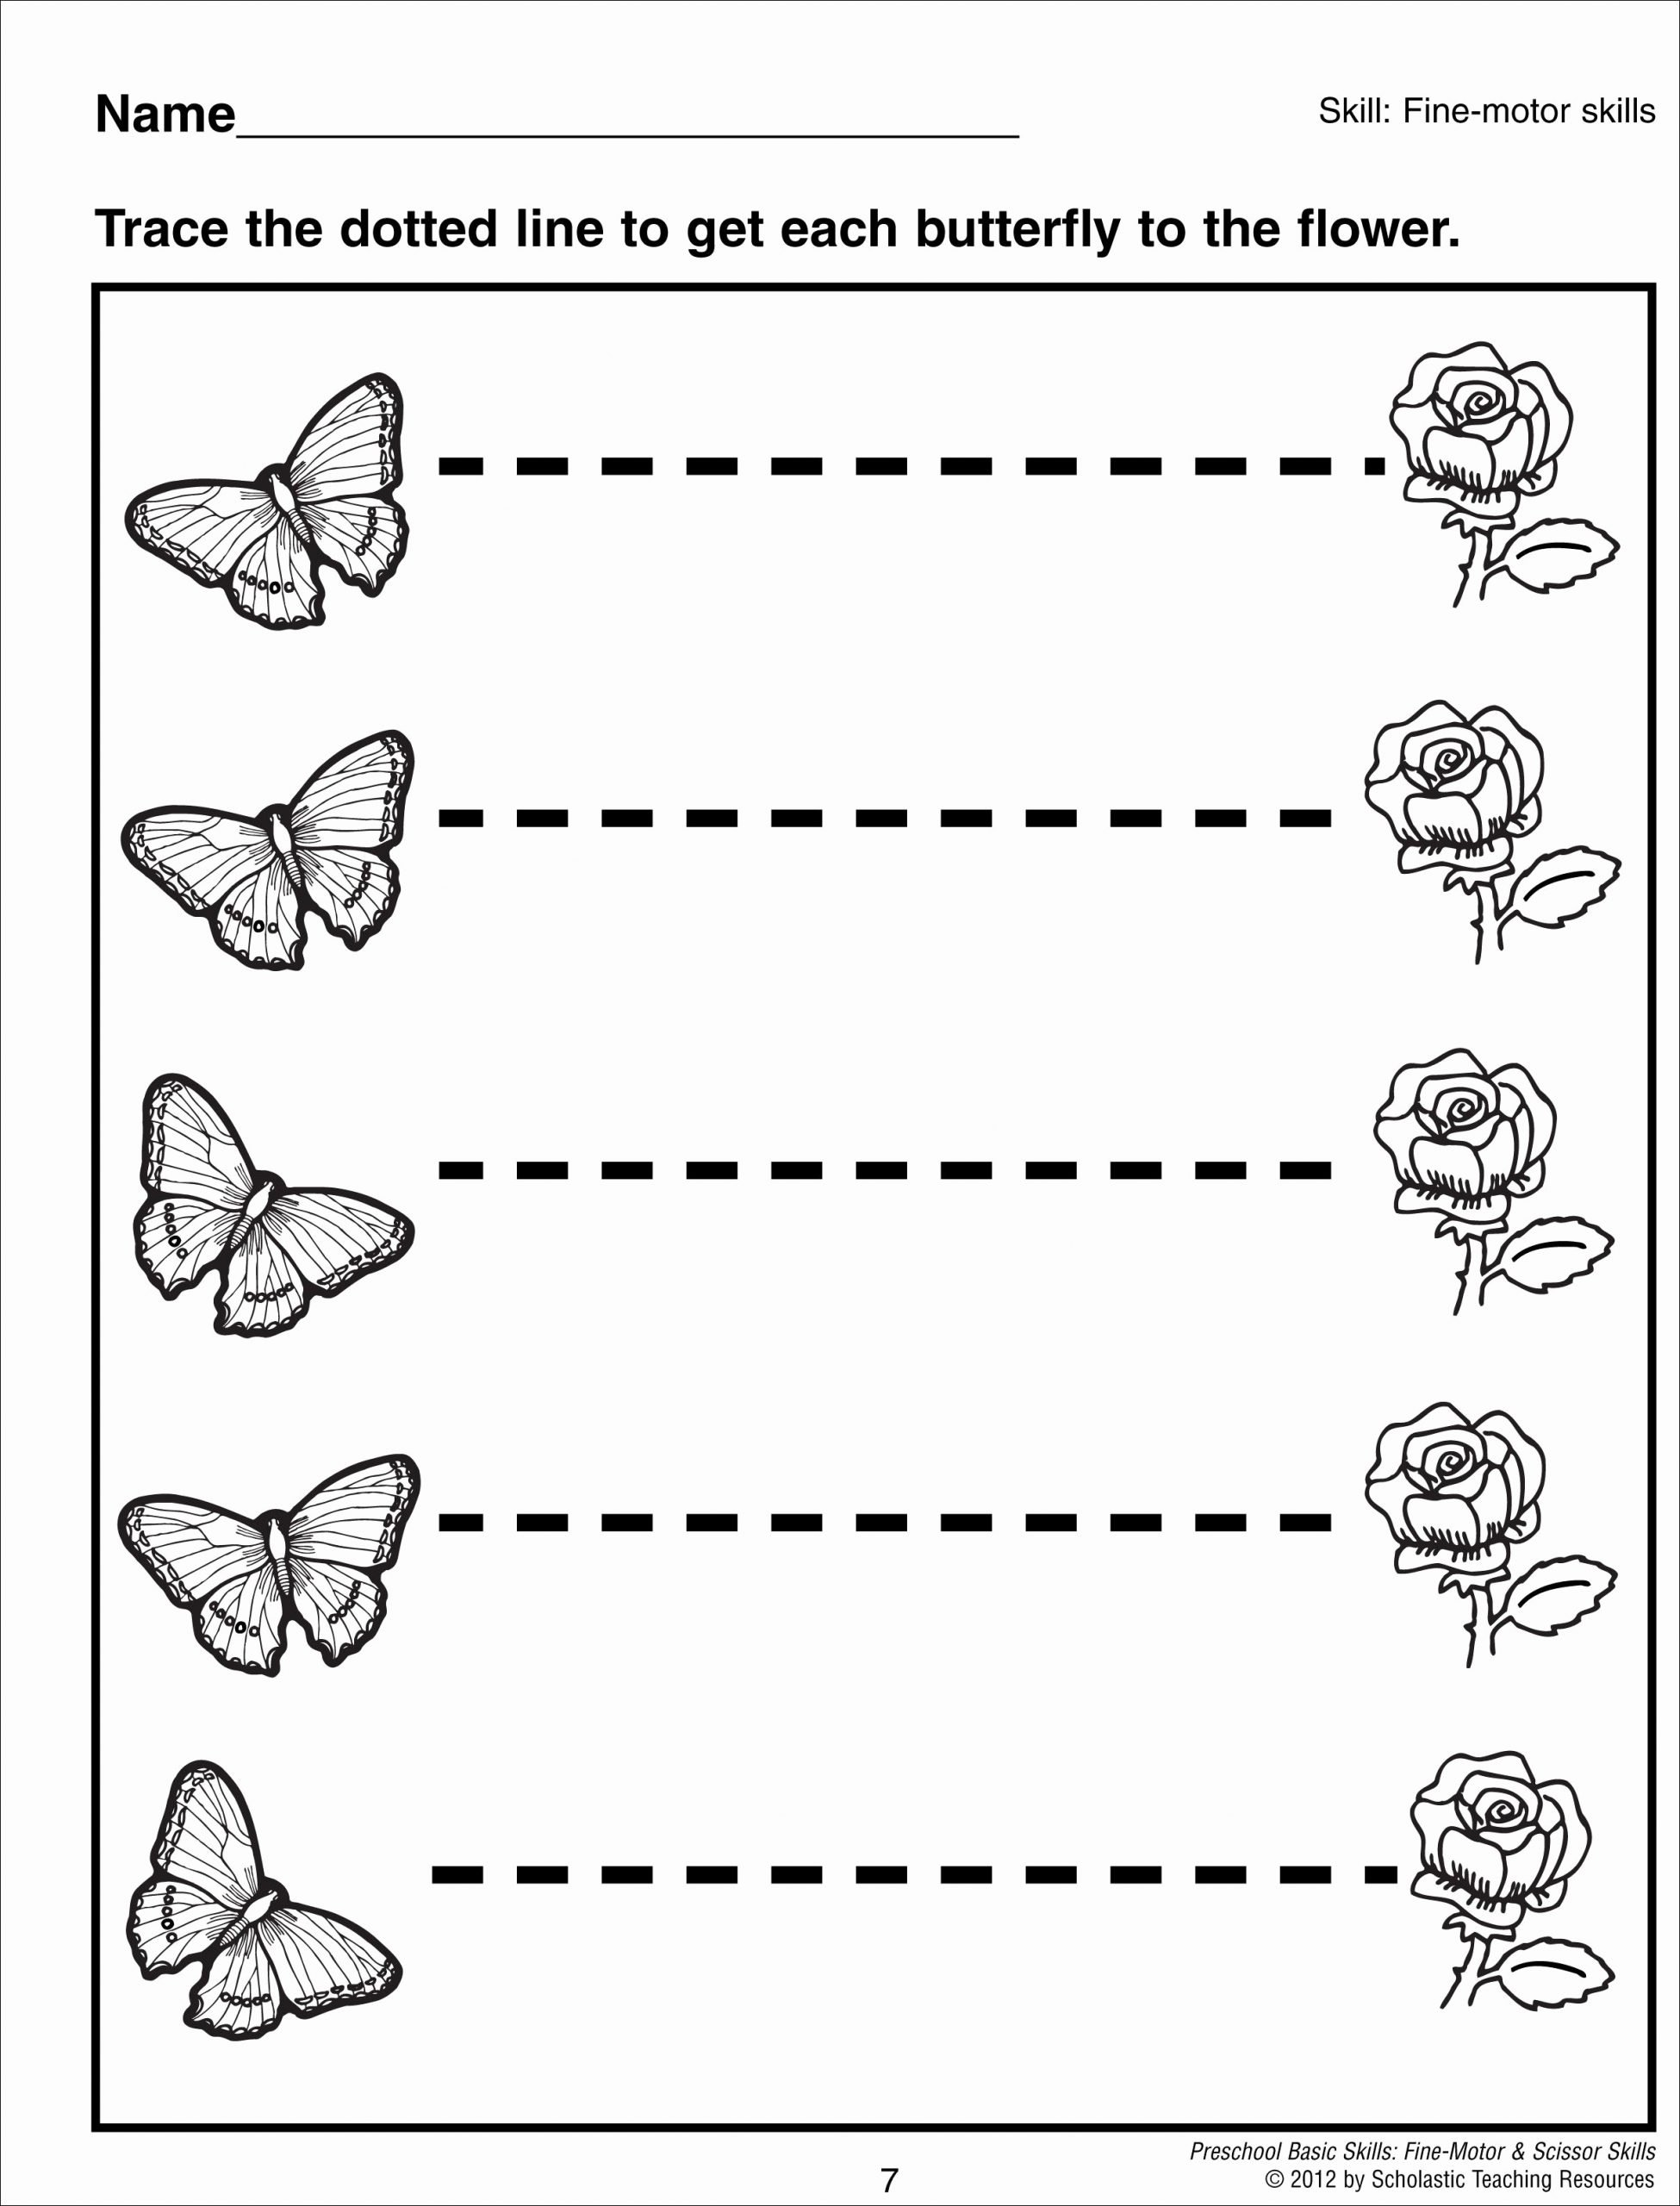 Line Tracing Worksheets for Preschoolers Lovely Tracing Horizontal Lines Preschool Basic Skills Fine Motor